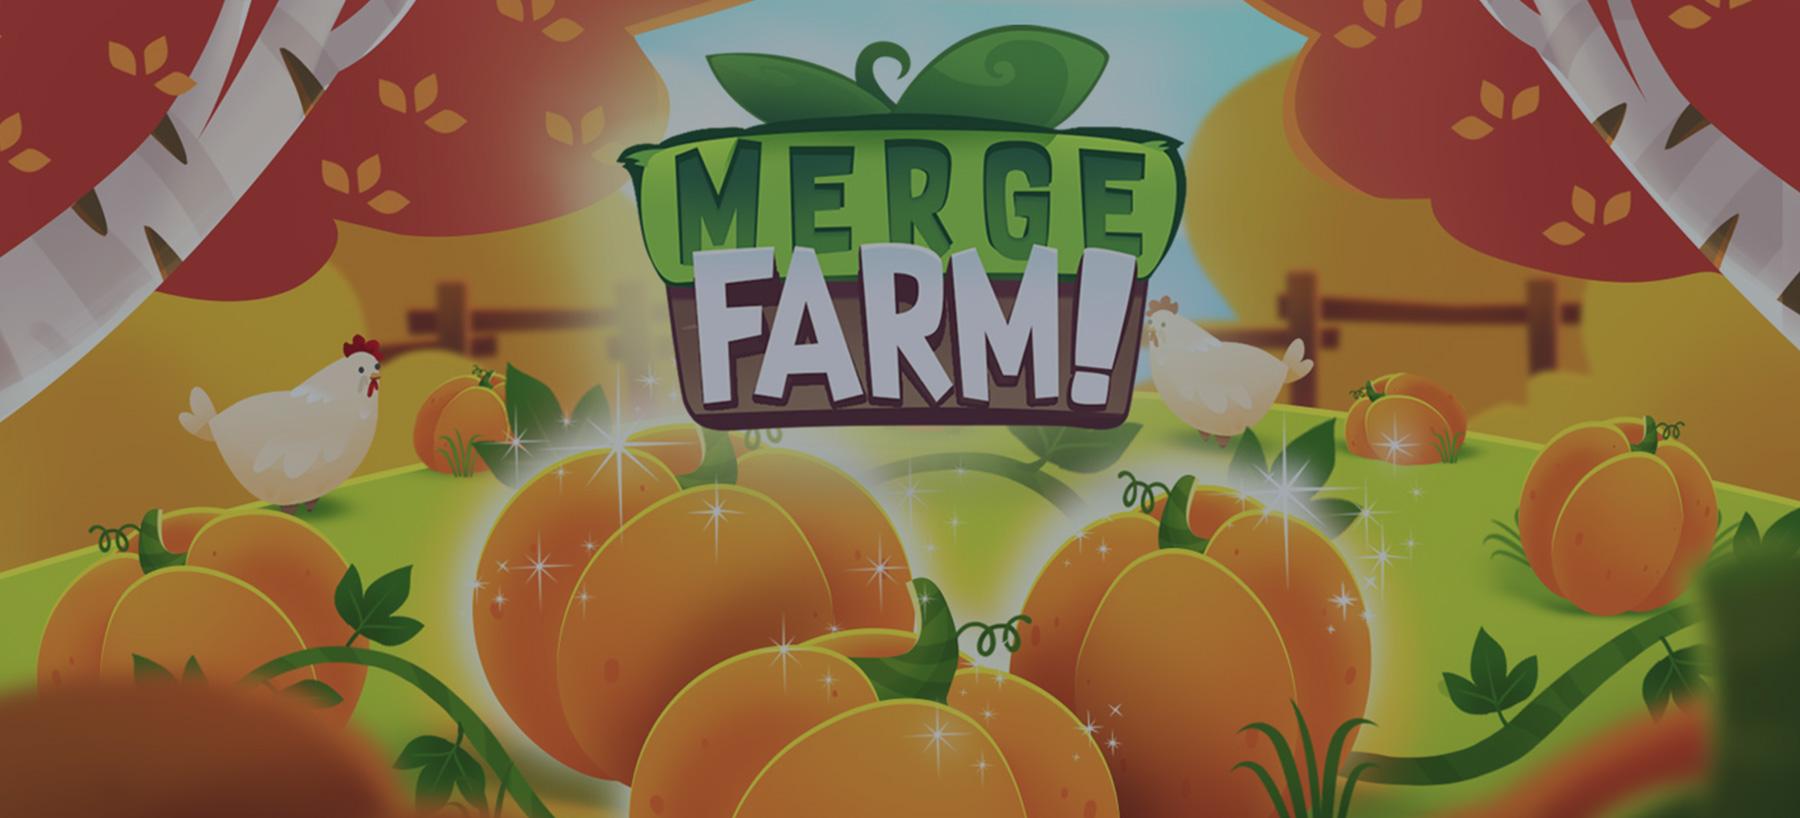 Merge Farm! Hero Image